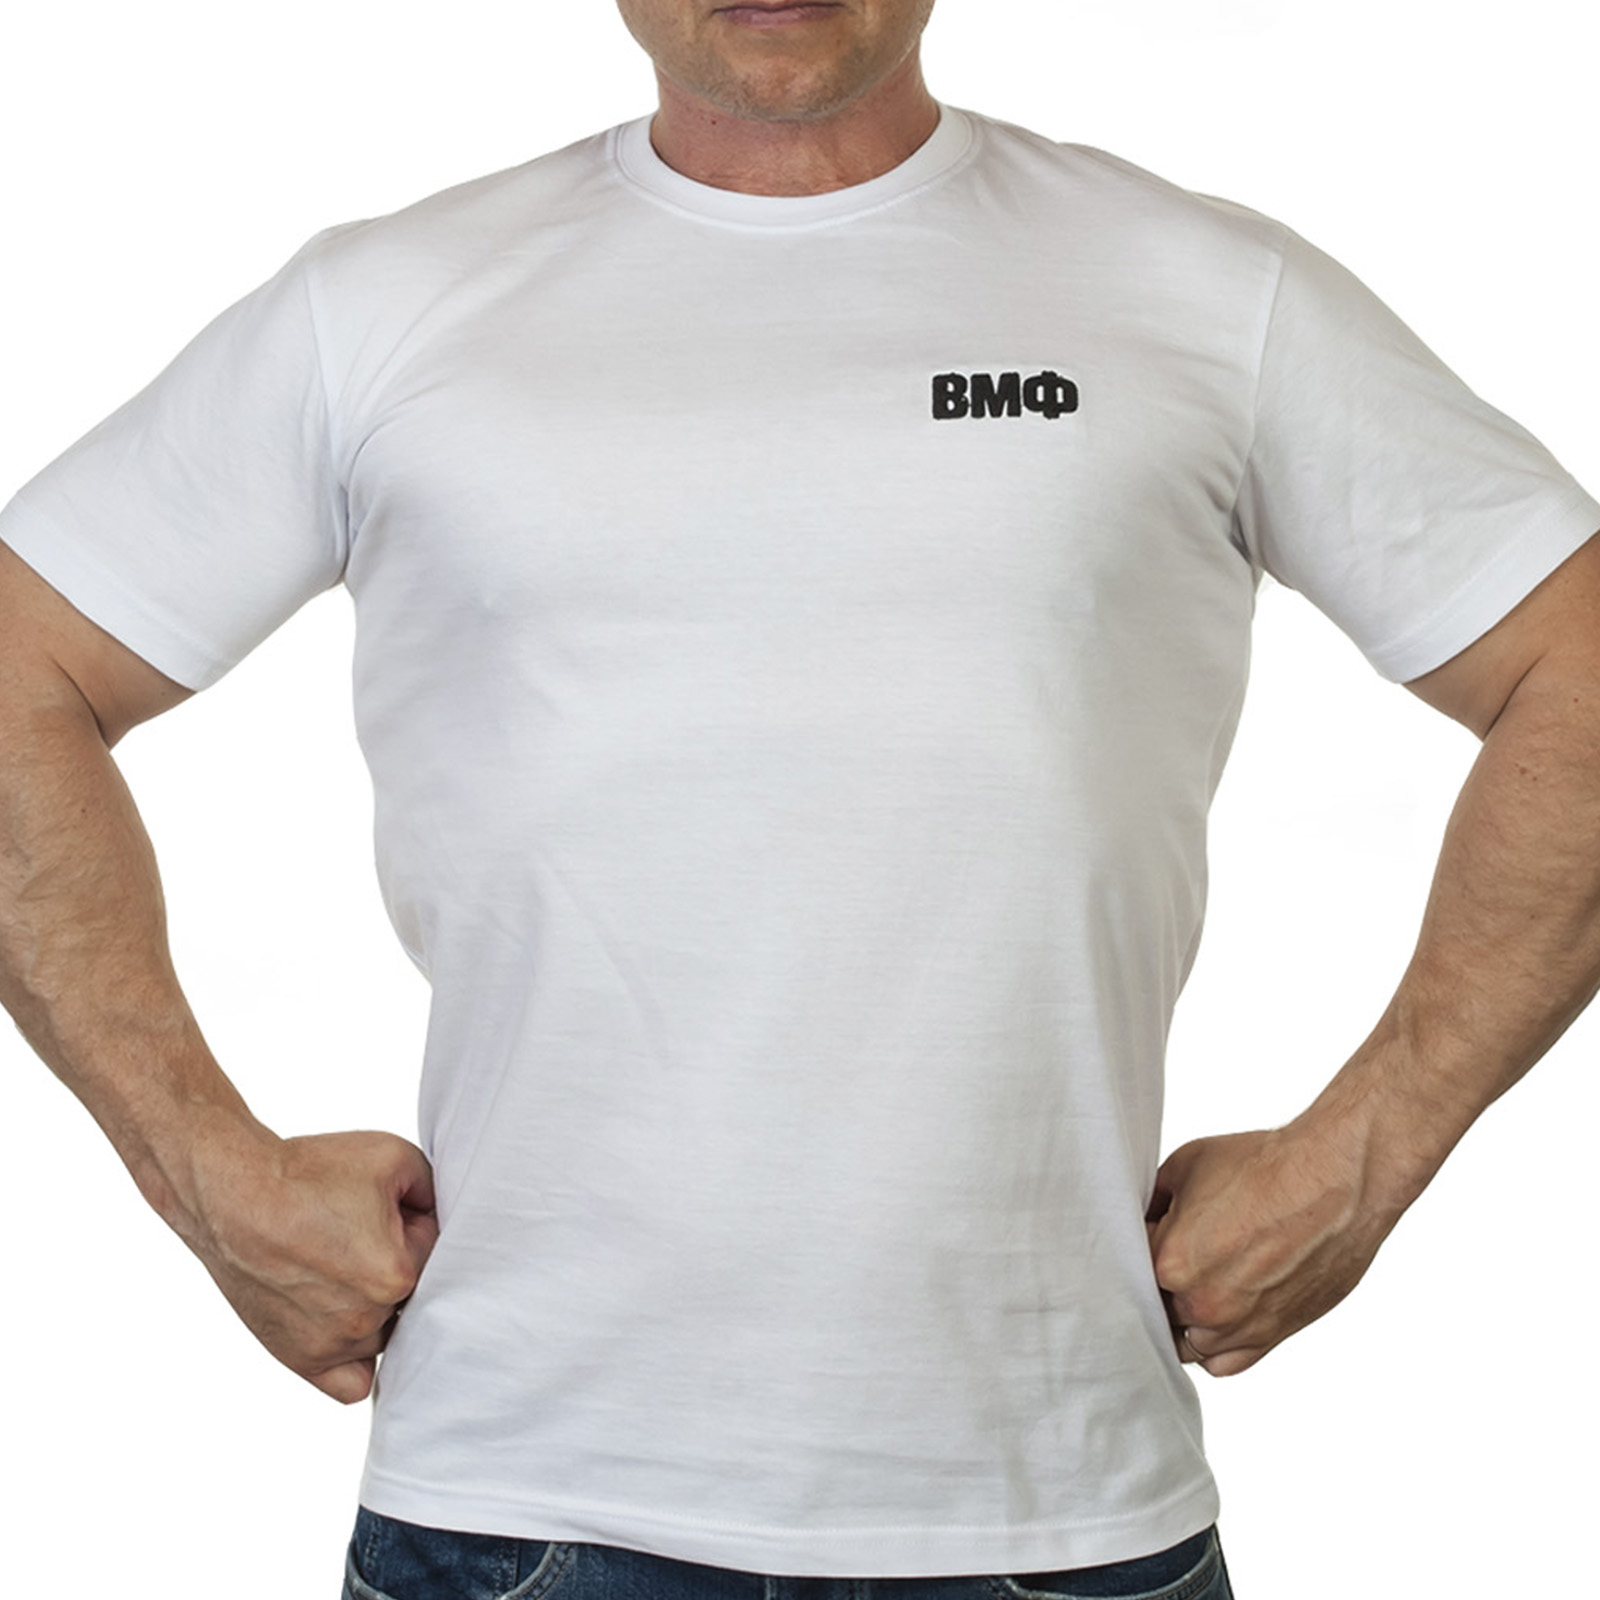 Белая футболка ВМФ с вышивкой на груди